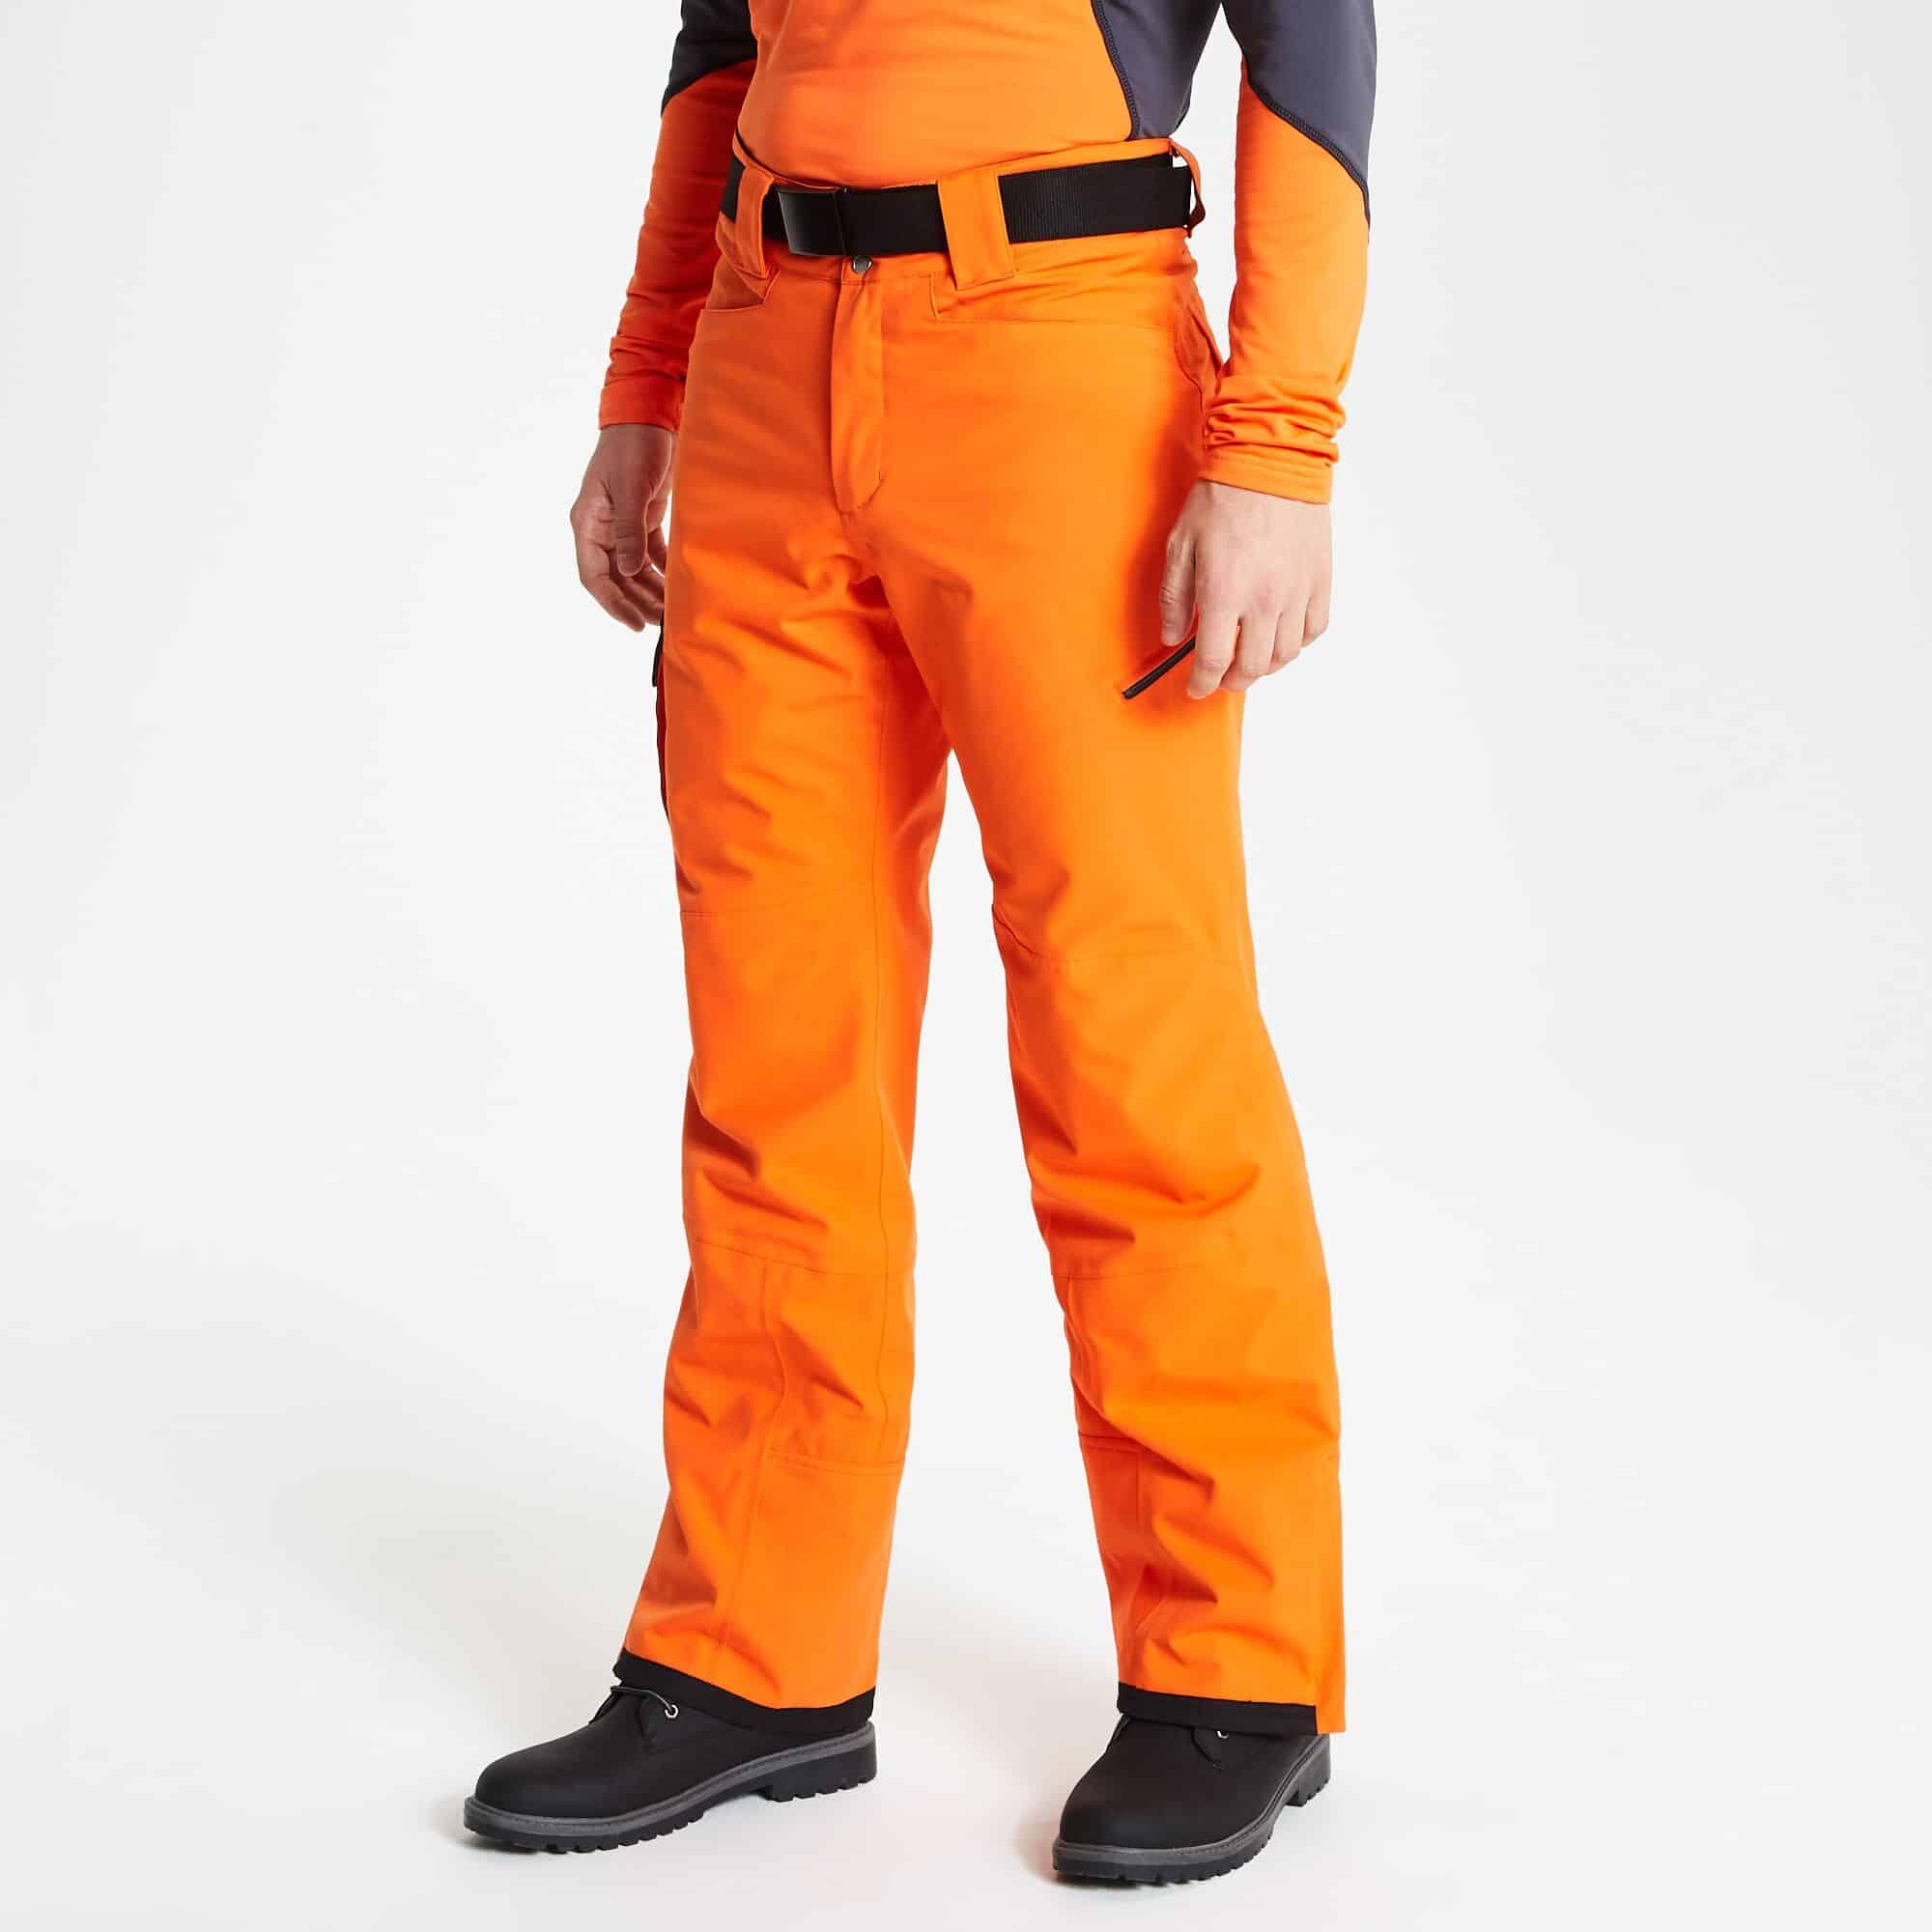 absolute orange front model dmw462 4L7